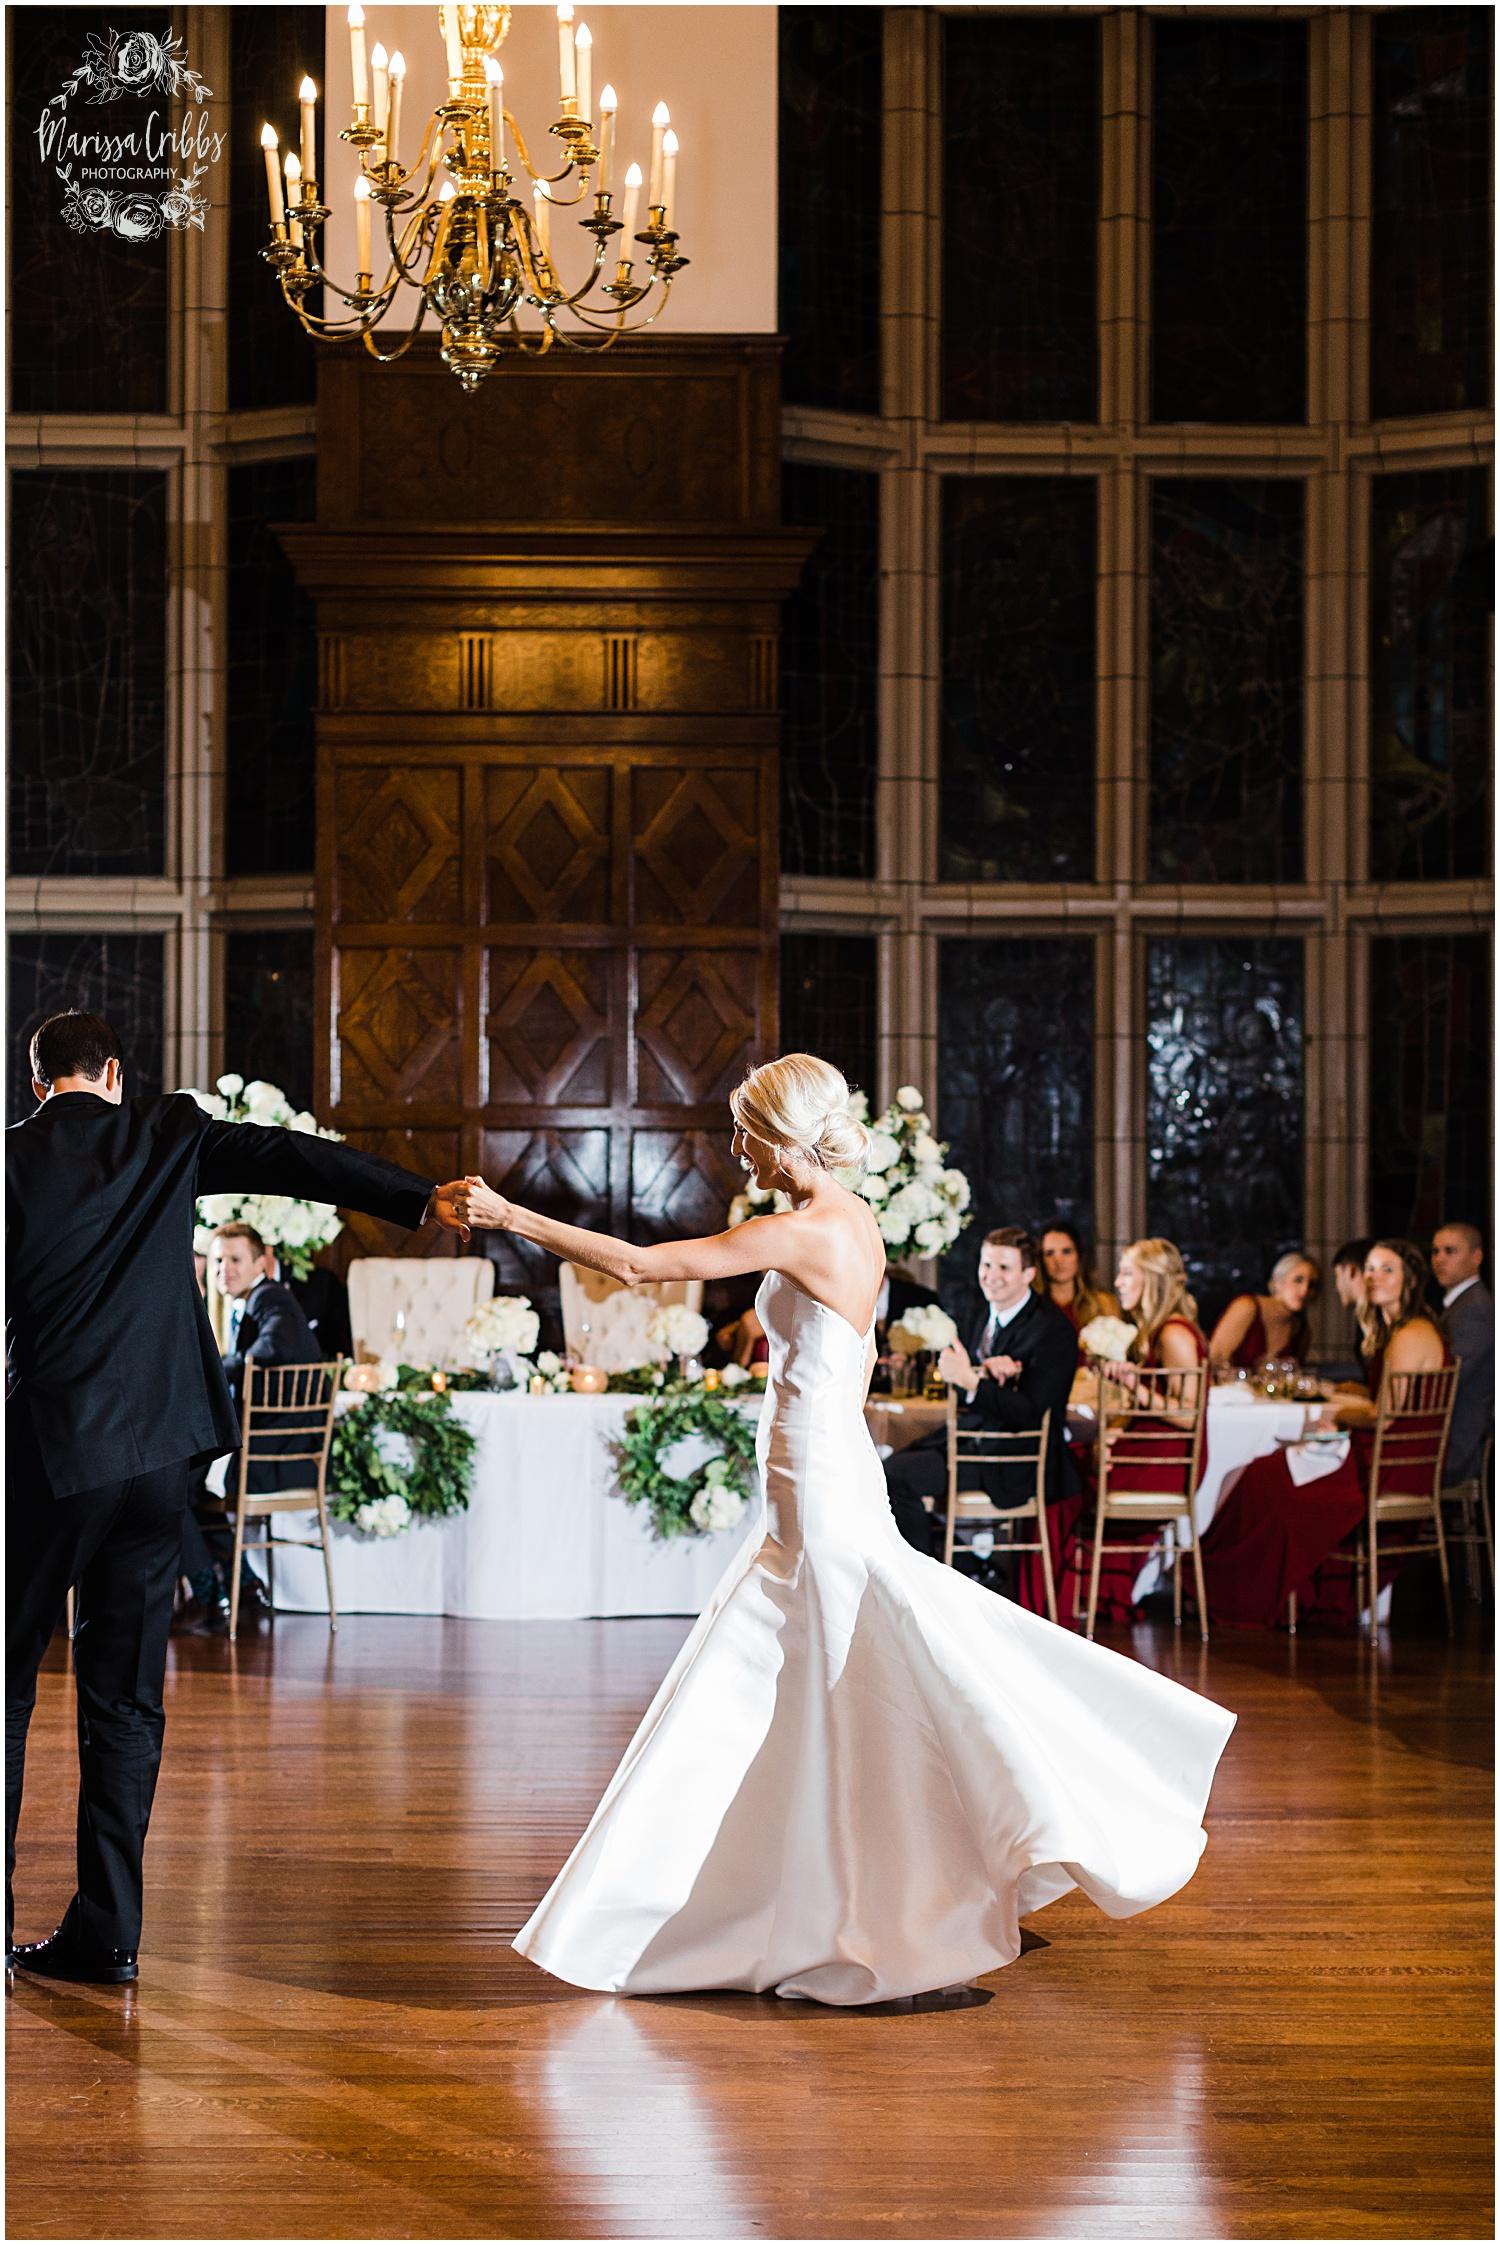 NOLL WEDDING | THE BRASS ON BALTIMORE | MARISSA CRIBBS PHOTOGRAPHY_6377.jpg